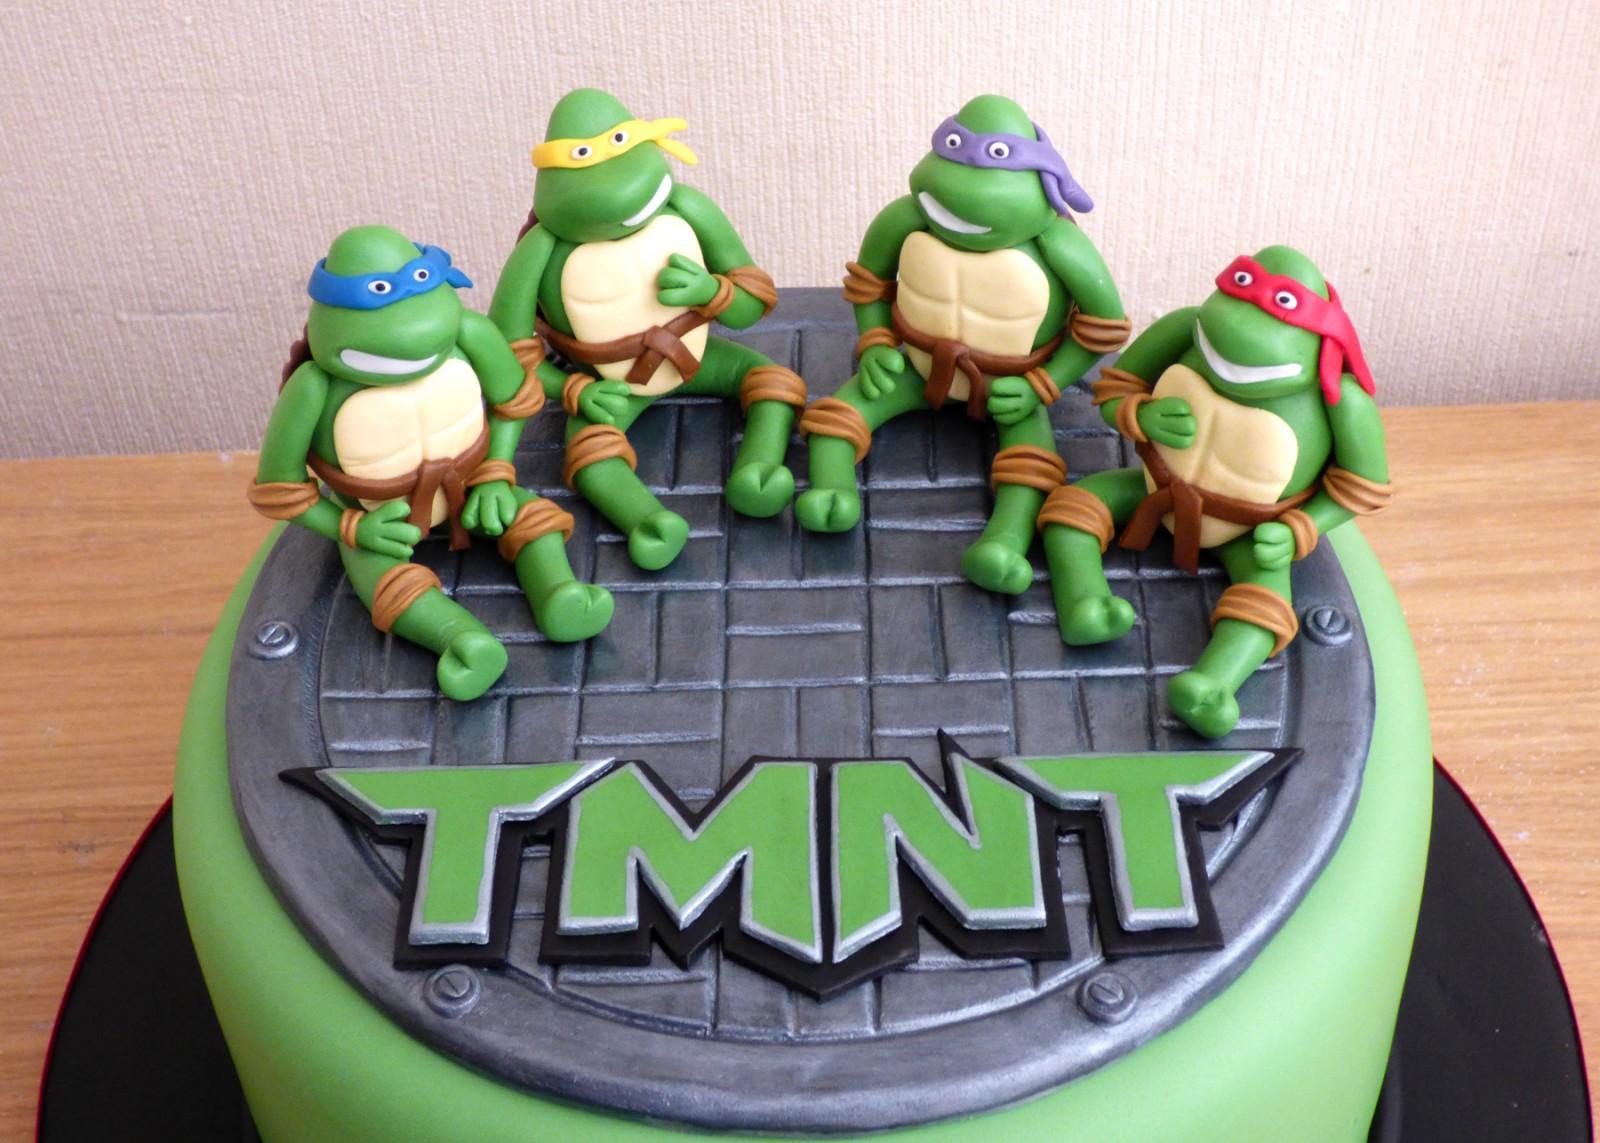 Wondrous Teenage Mutant Ninja Turtles Birthday Cake Susies Cakes Funny Birthday Cards Online Elaedamsfinfo